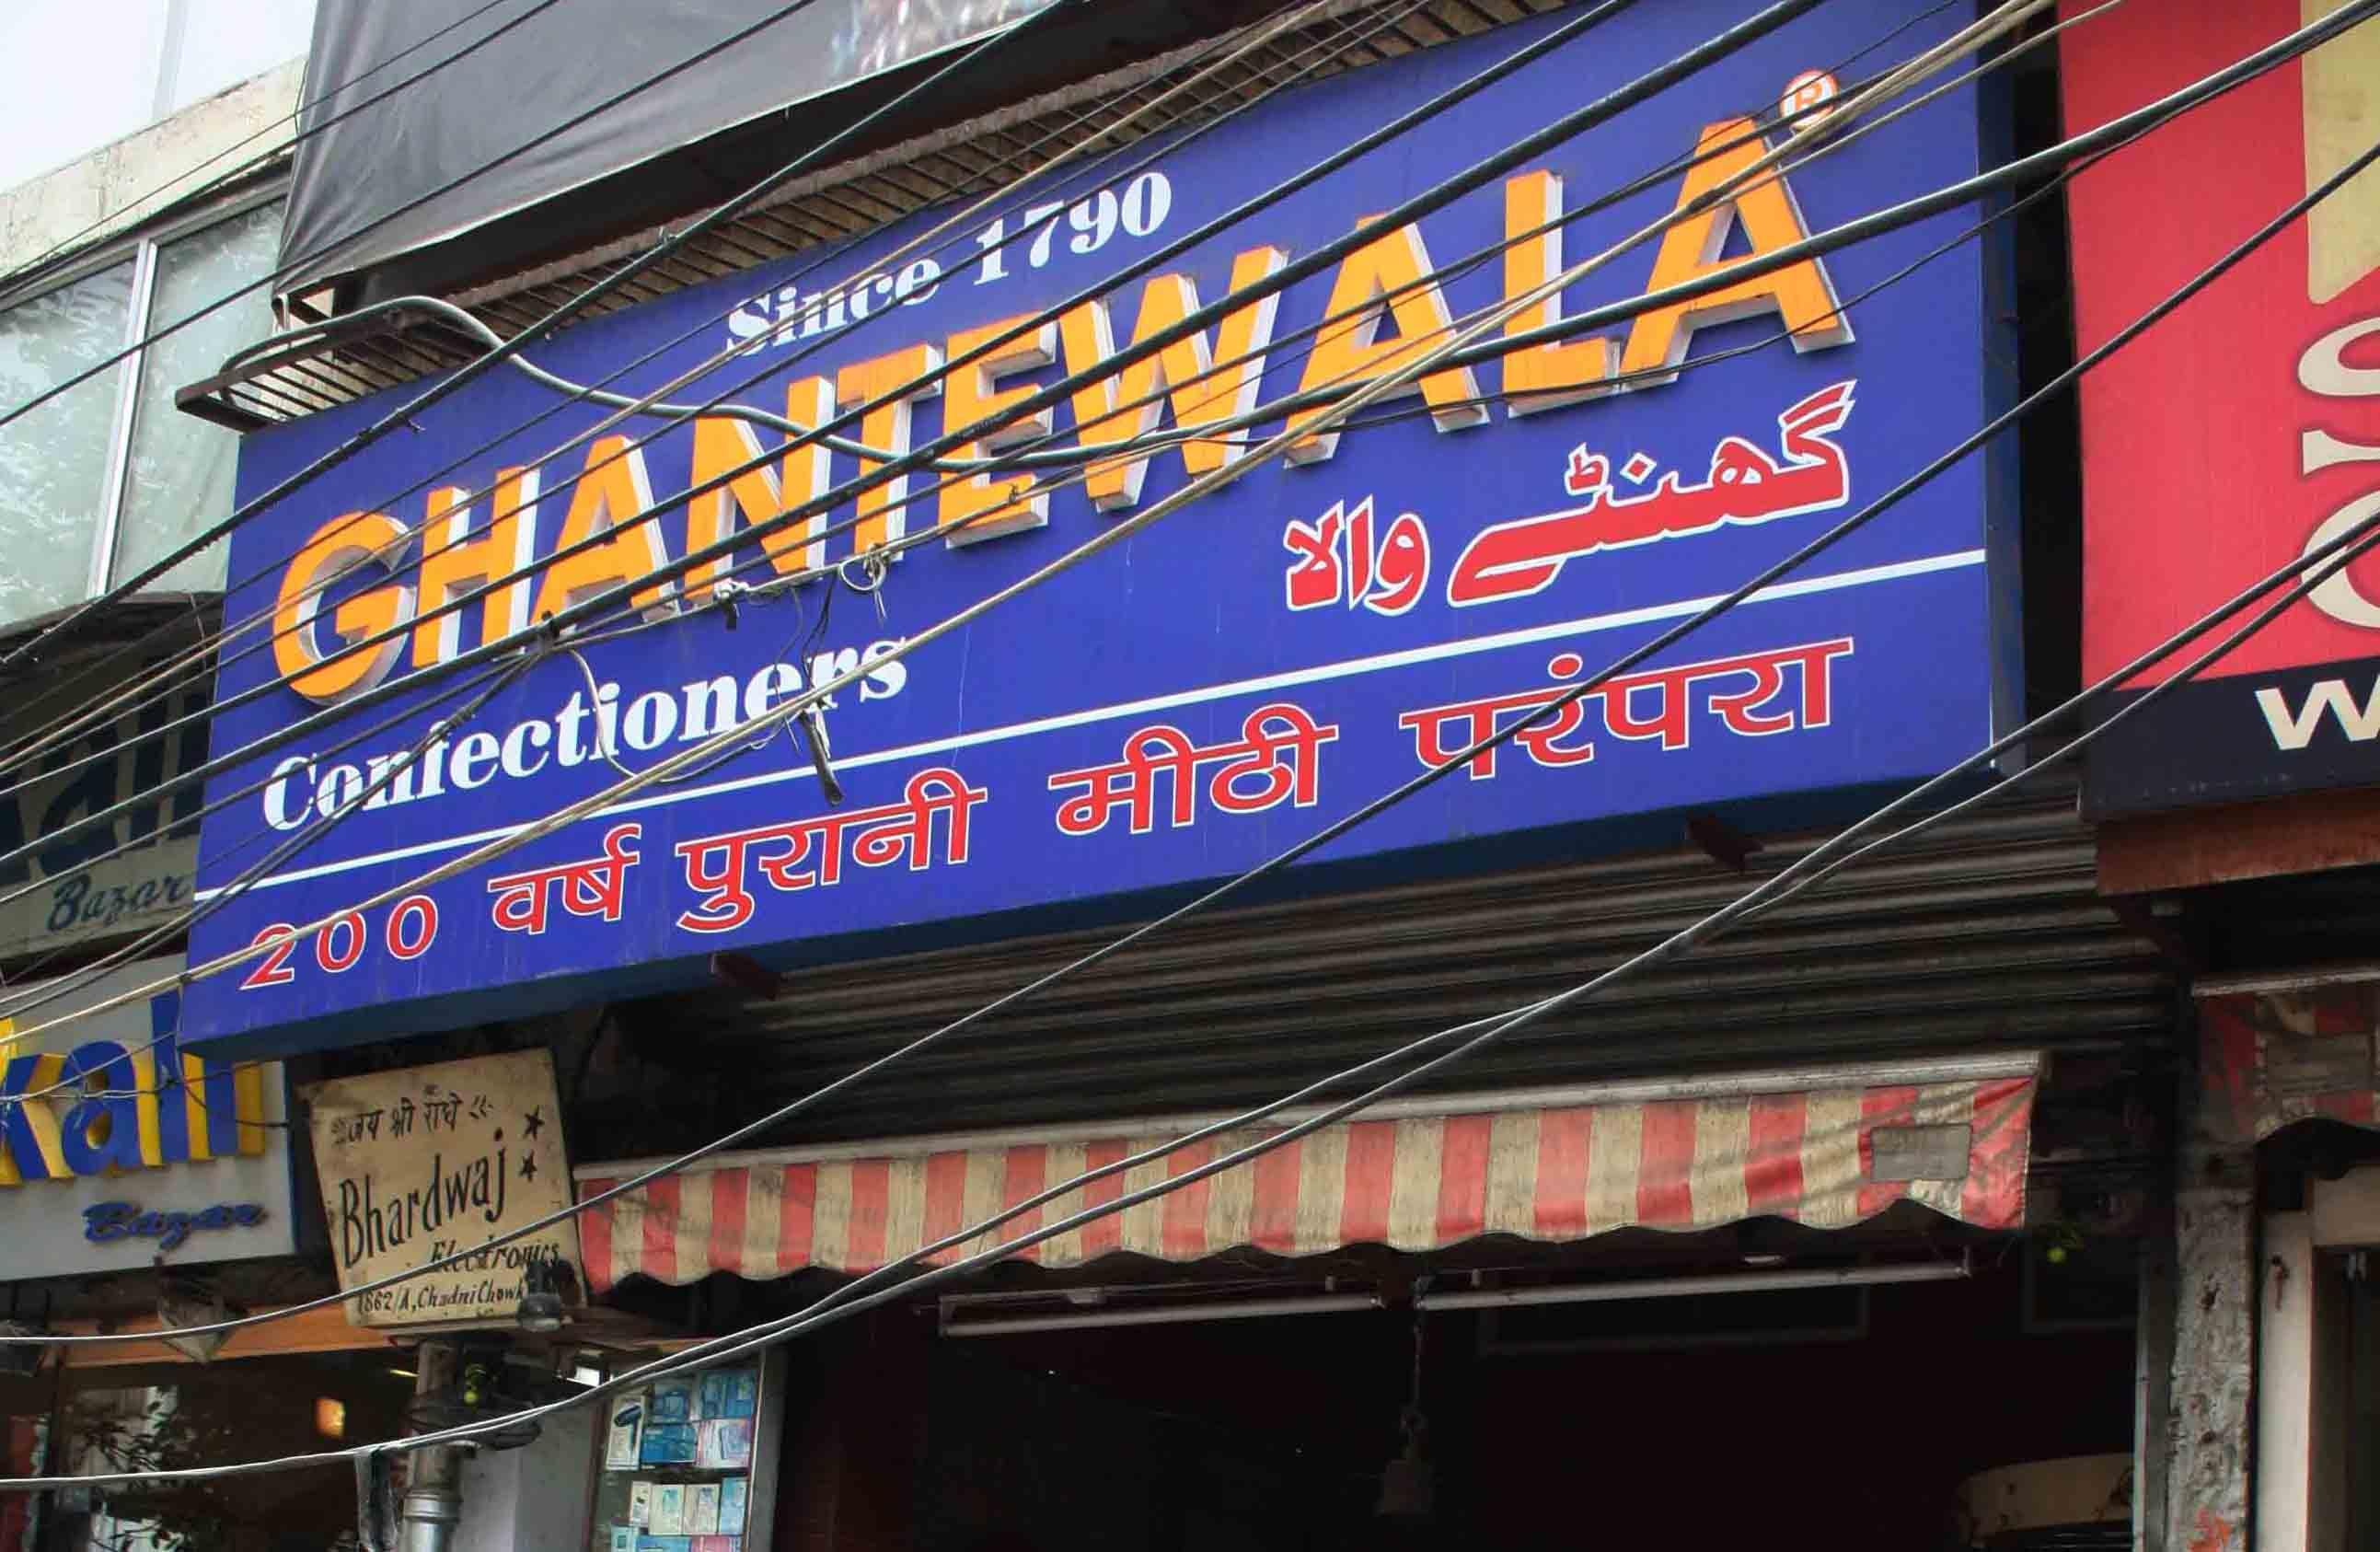 City Obituary - Ghantewala Confectioners (1790-2015), Chandni Chowk